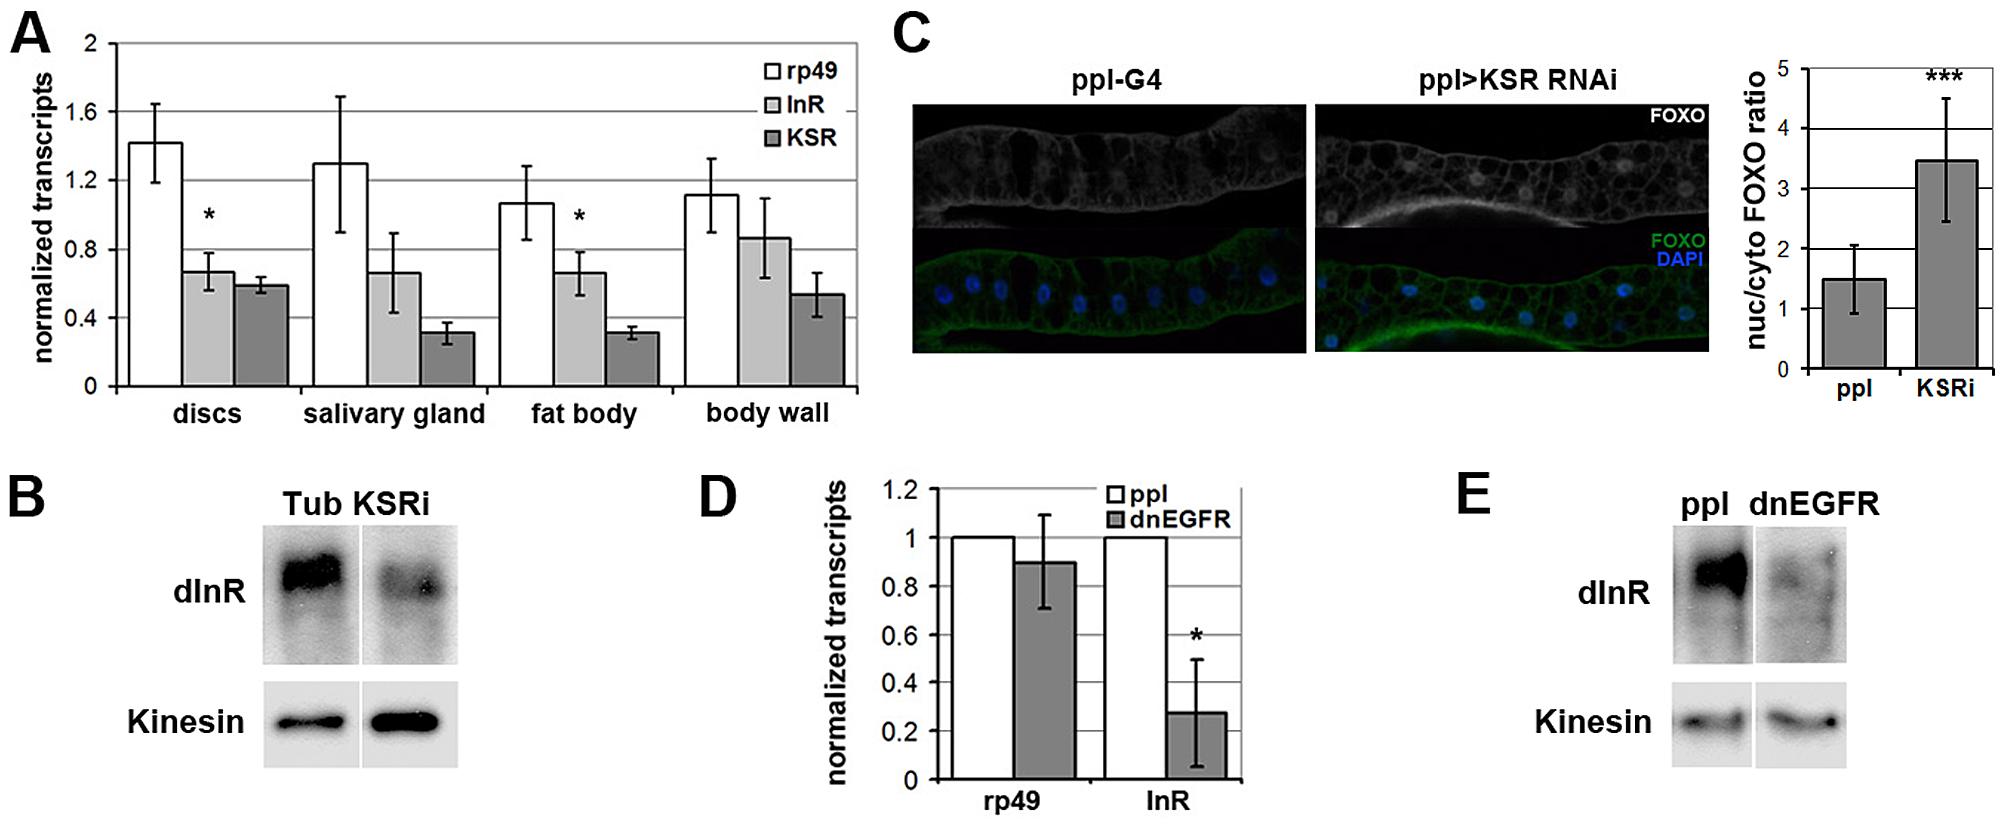 EGFR-MAPK/ERK signaling regulates InR expression and FOXO localization <i>in vivo</i>.